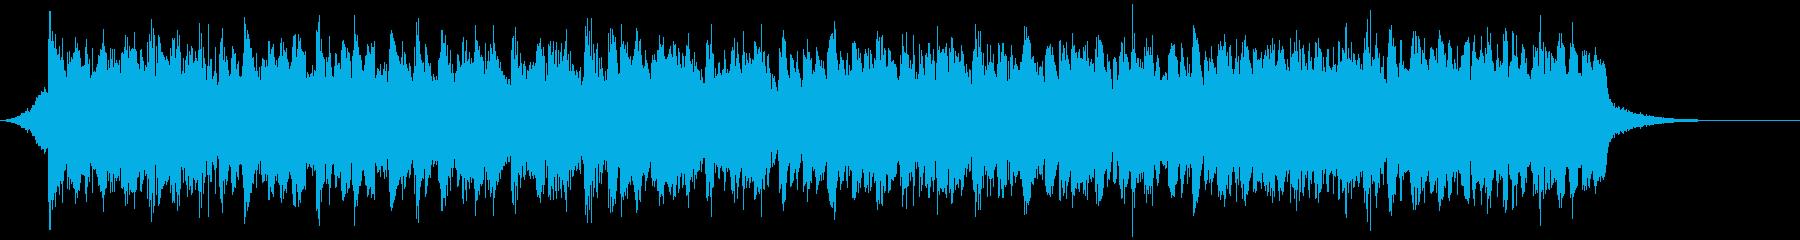 Piano House 1の再生済みの波形